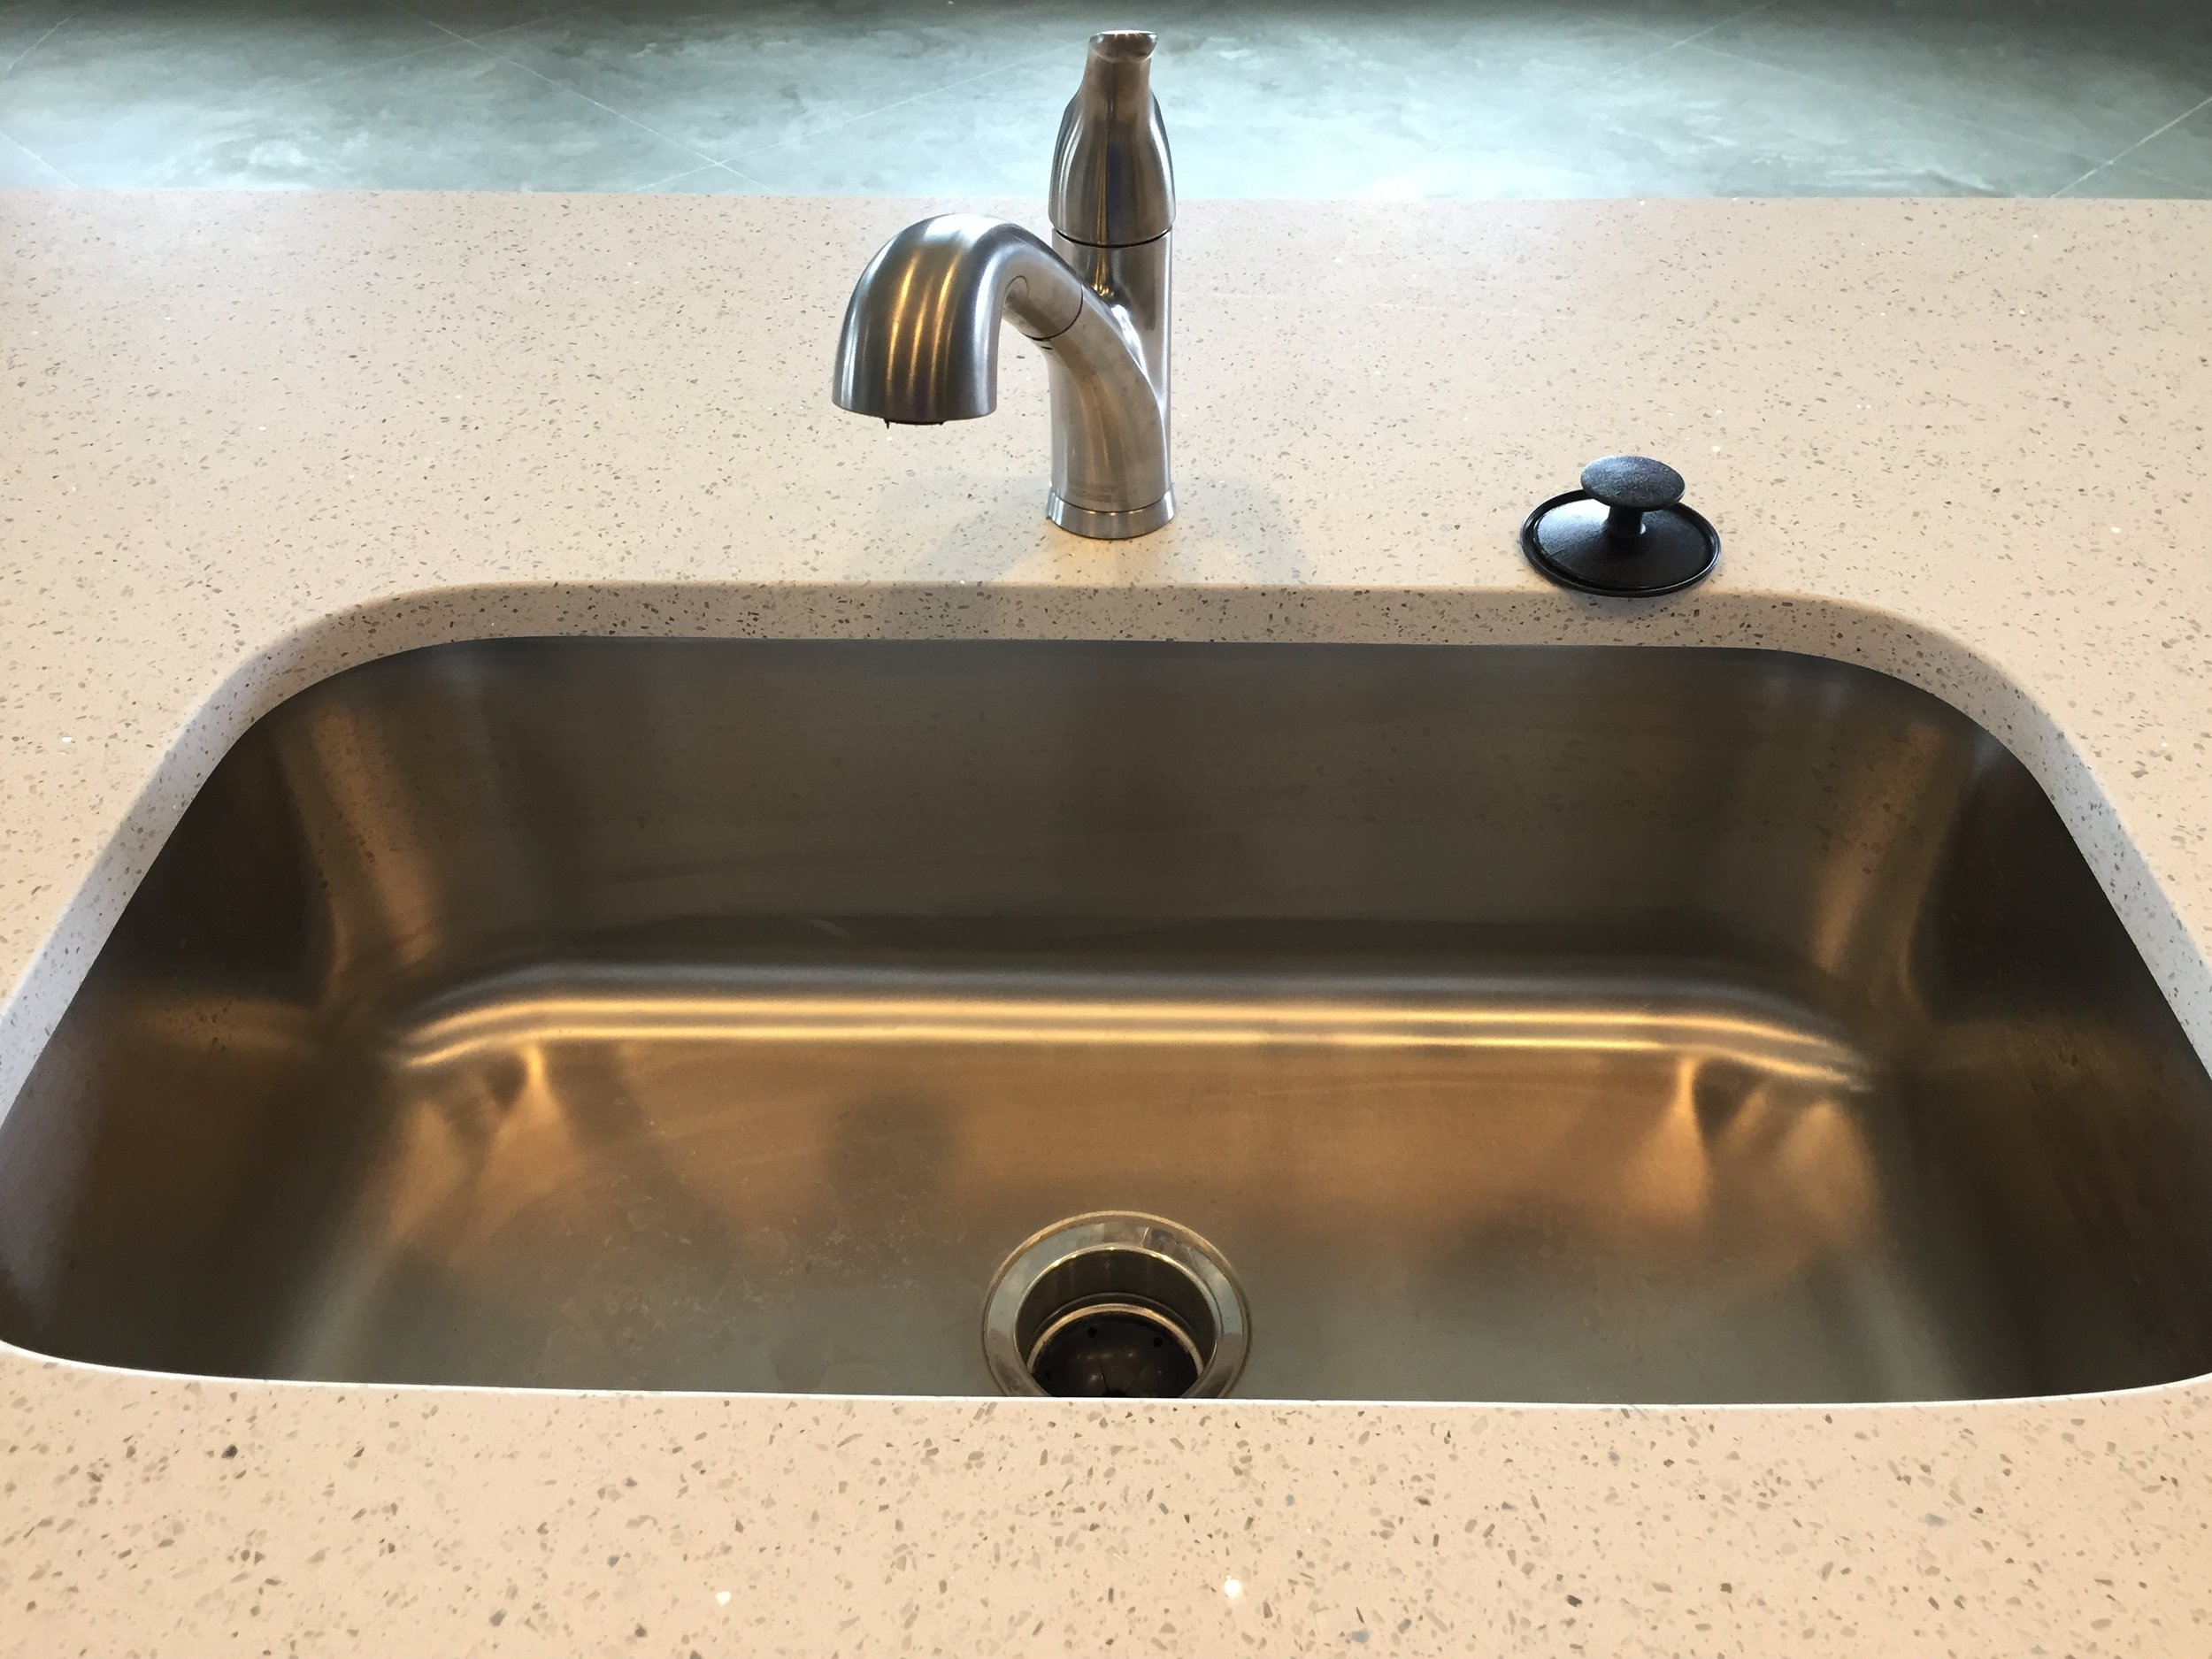 L92KV sink.JPG